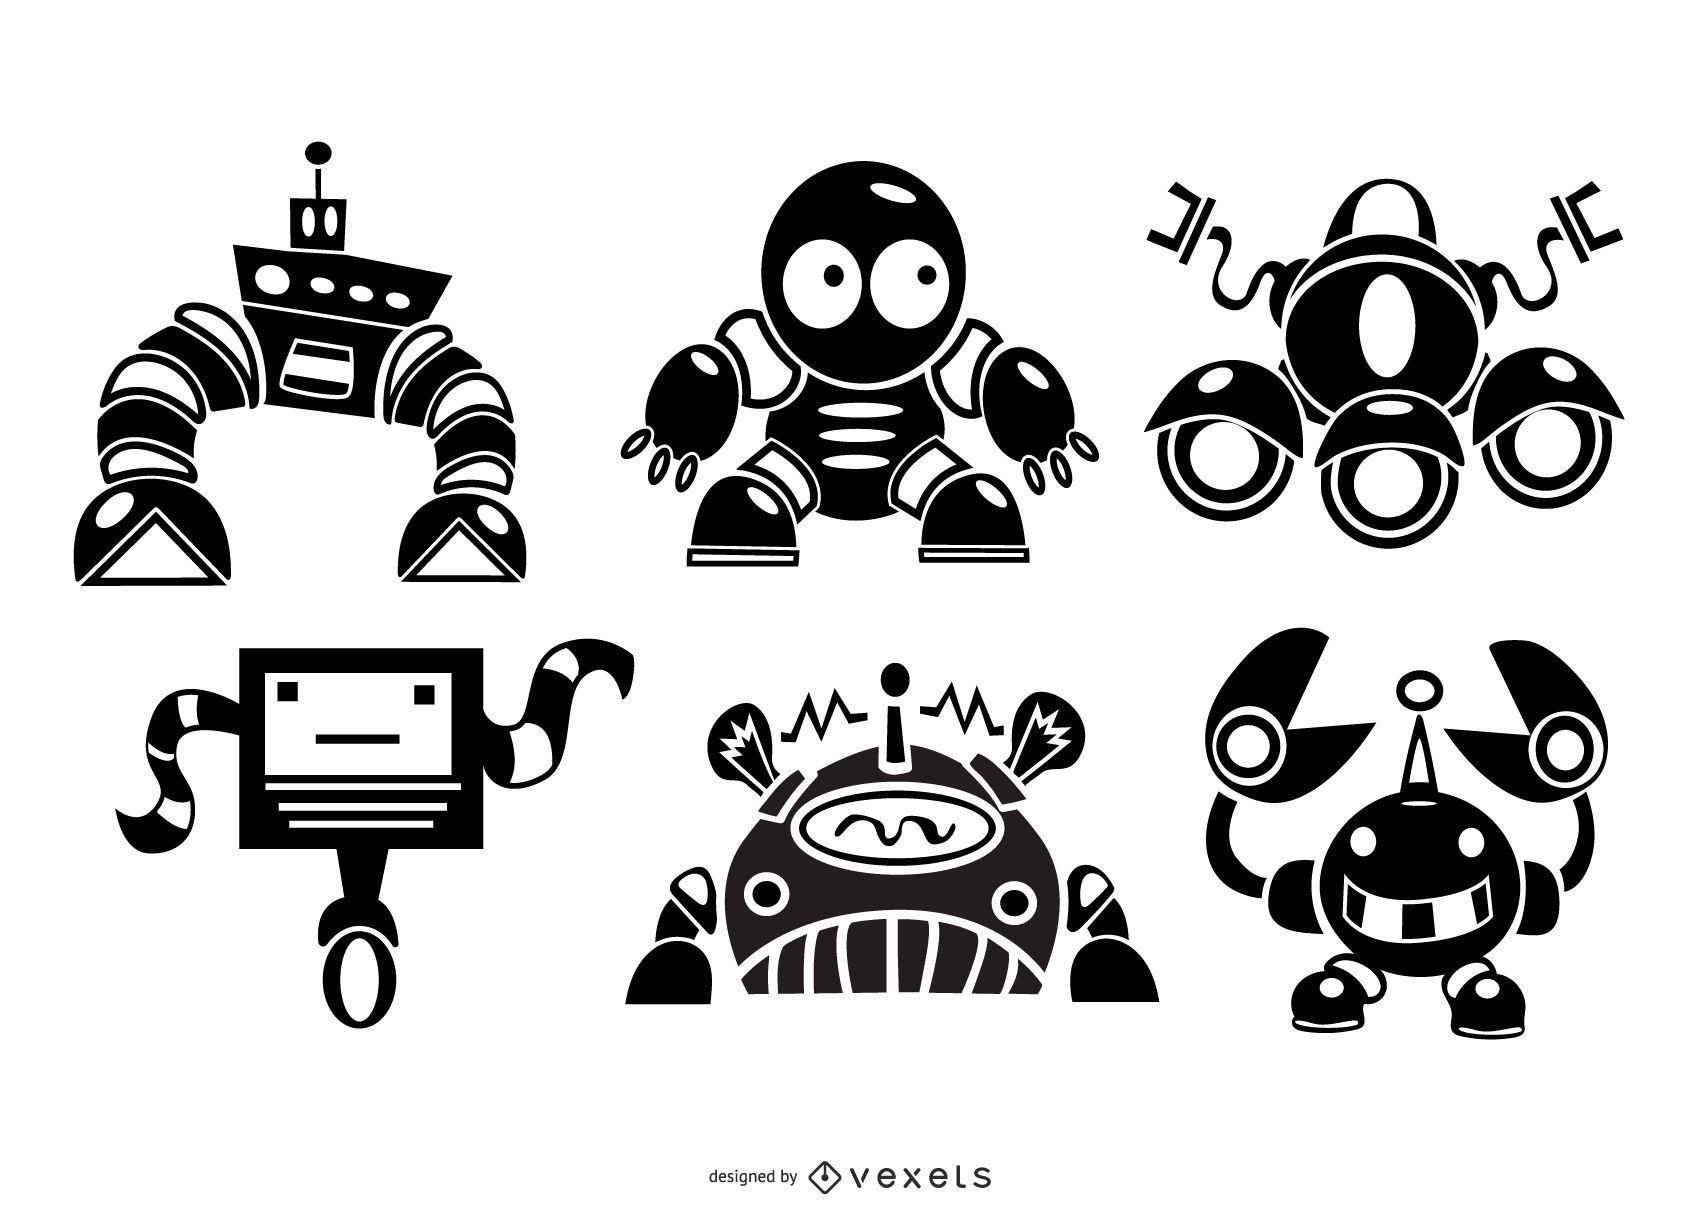 Lindo conjunto de silueta de robots